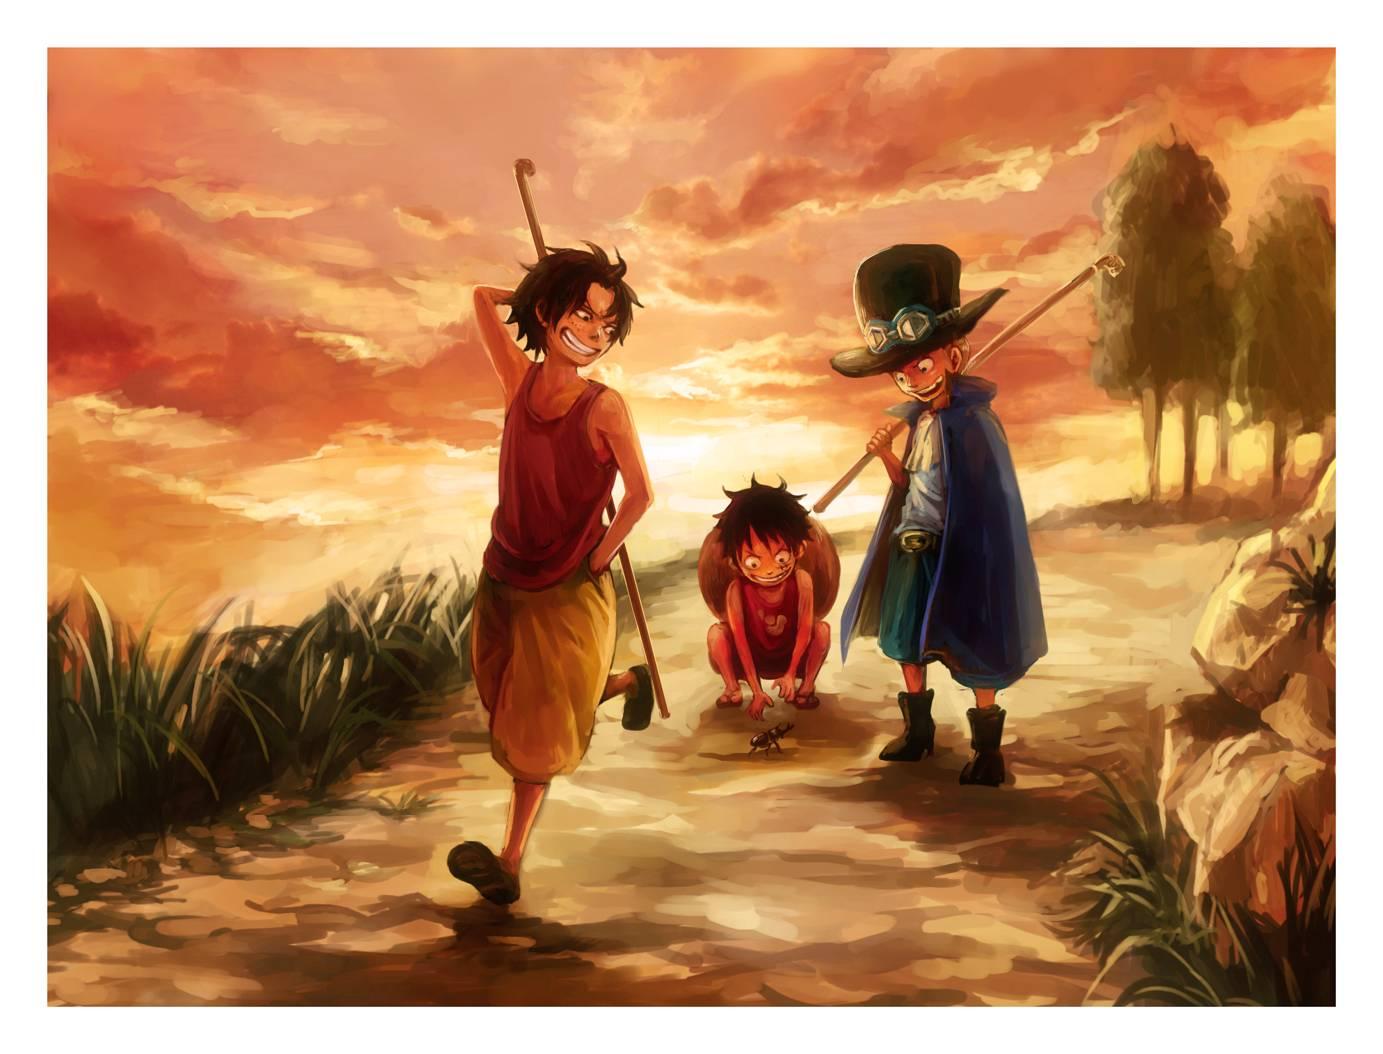 DP BBM Gambar Kata Bijak Anime One Piece Terbaru 2016